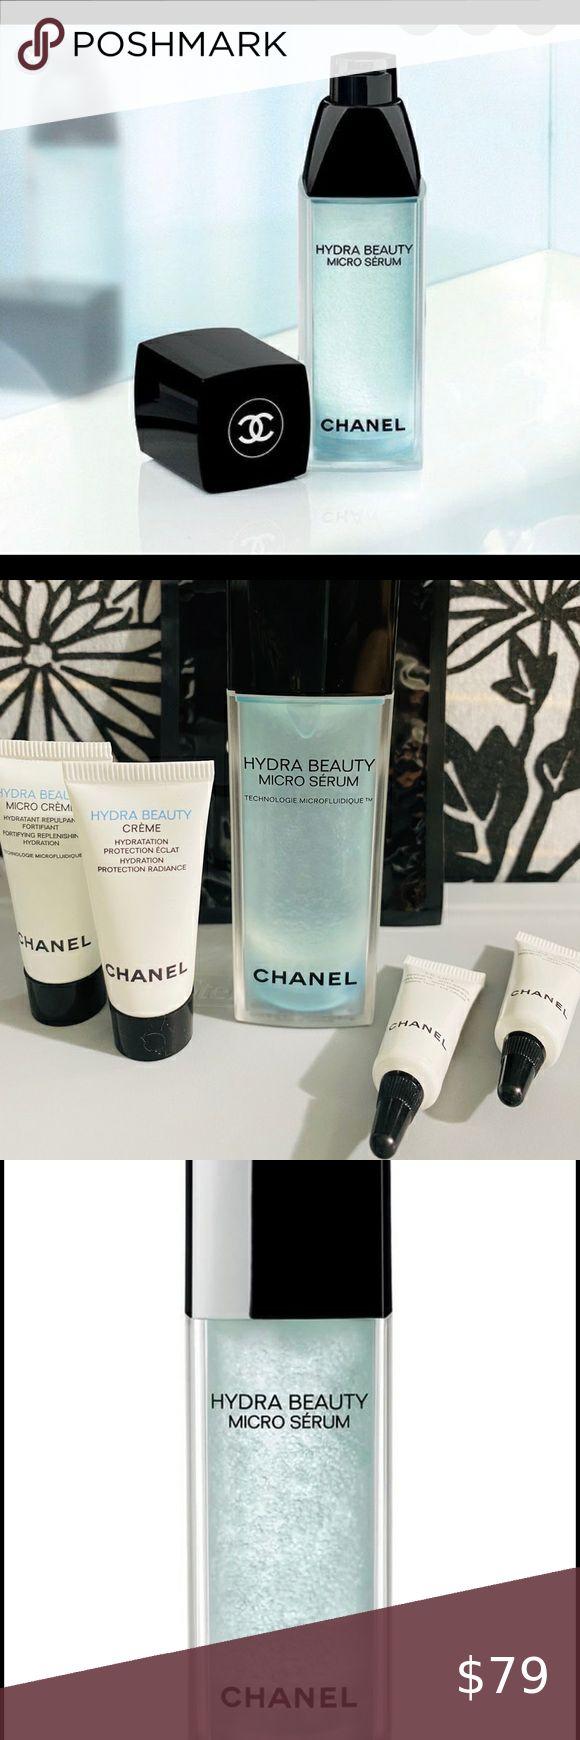 Chanel Hydra Beauty Micro Serum In 2020 Chanel Hydra Beauty Hydrating Serum Beauty Skin Care